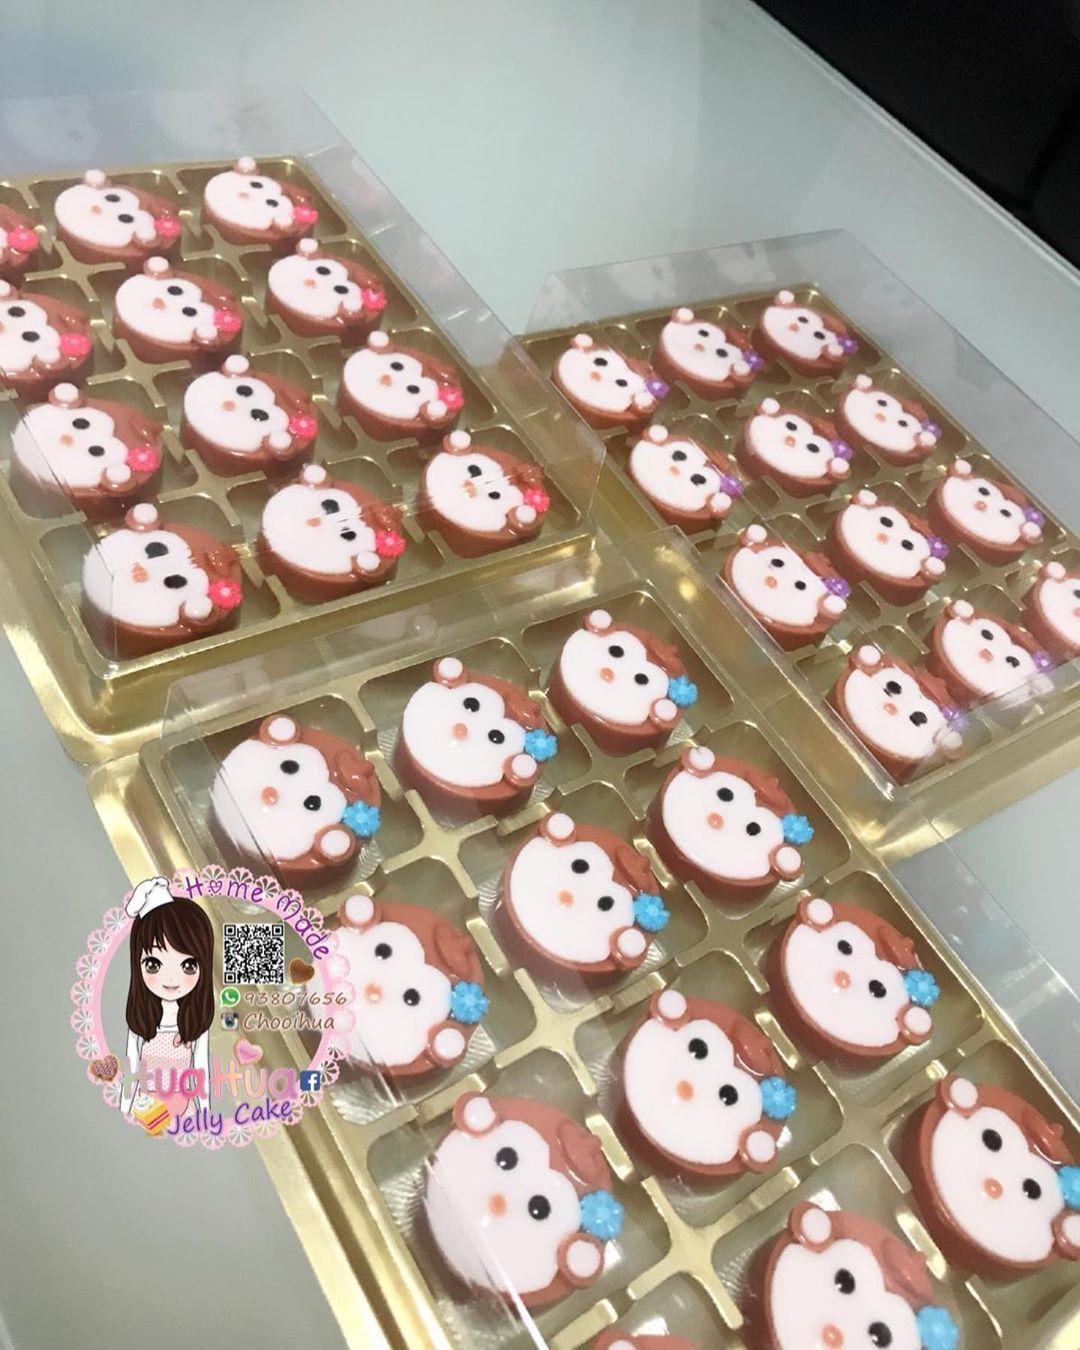 #Pikachu #agarcake #agaragar #agaragarcake #jelly #jellycake #birthday #blogshop #sgblogshop #sginstashop #starship.#sgfoodies #sgfood #dessert #delicio